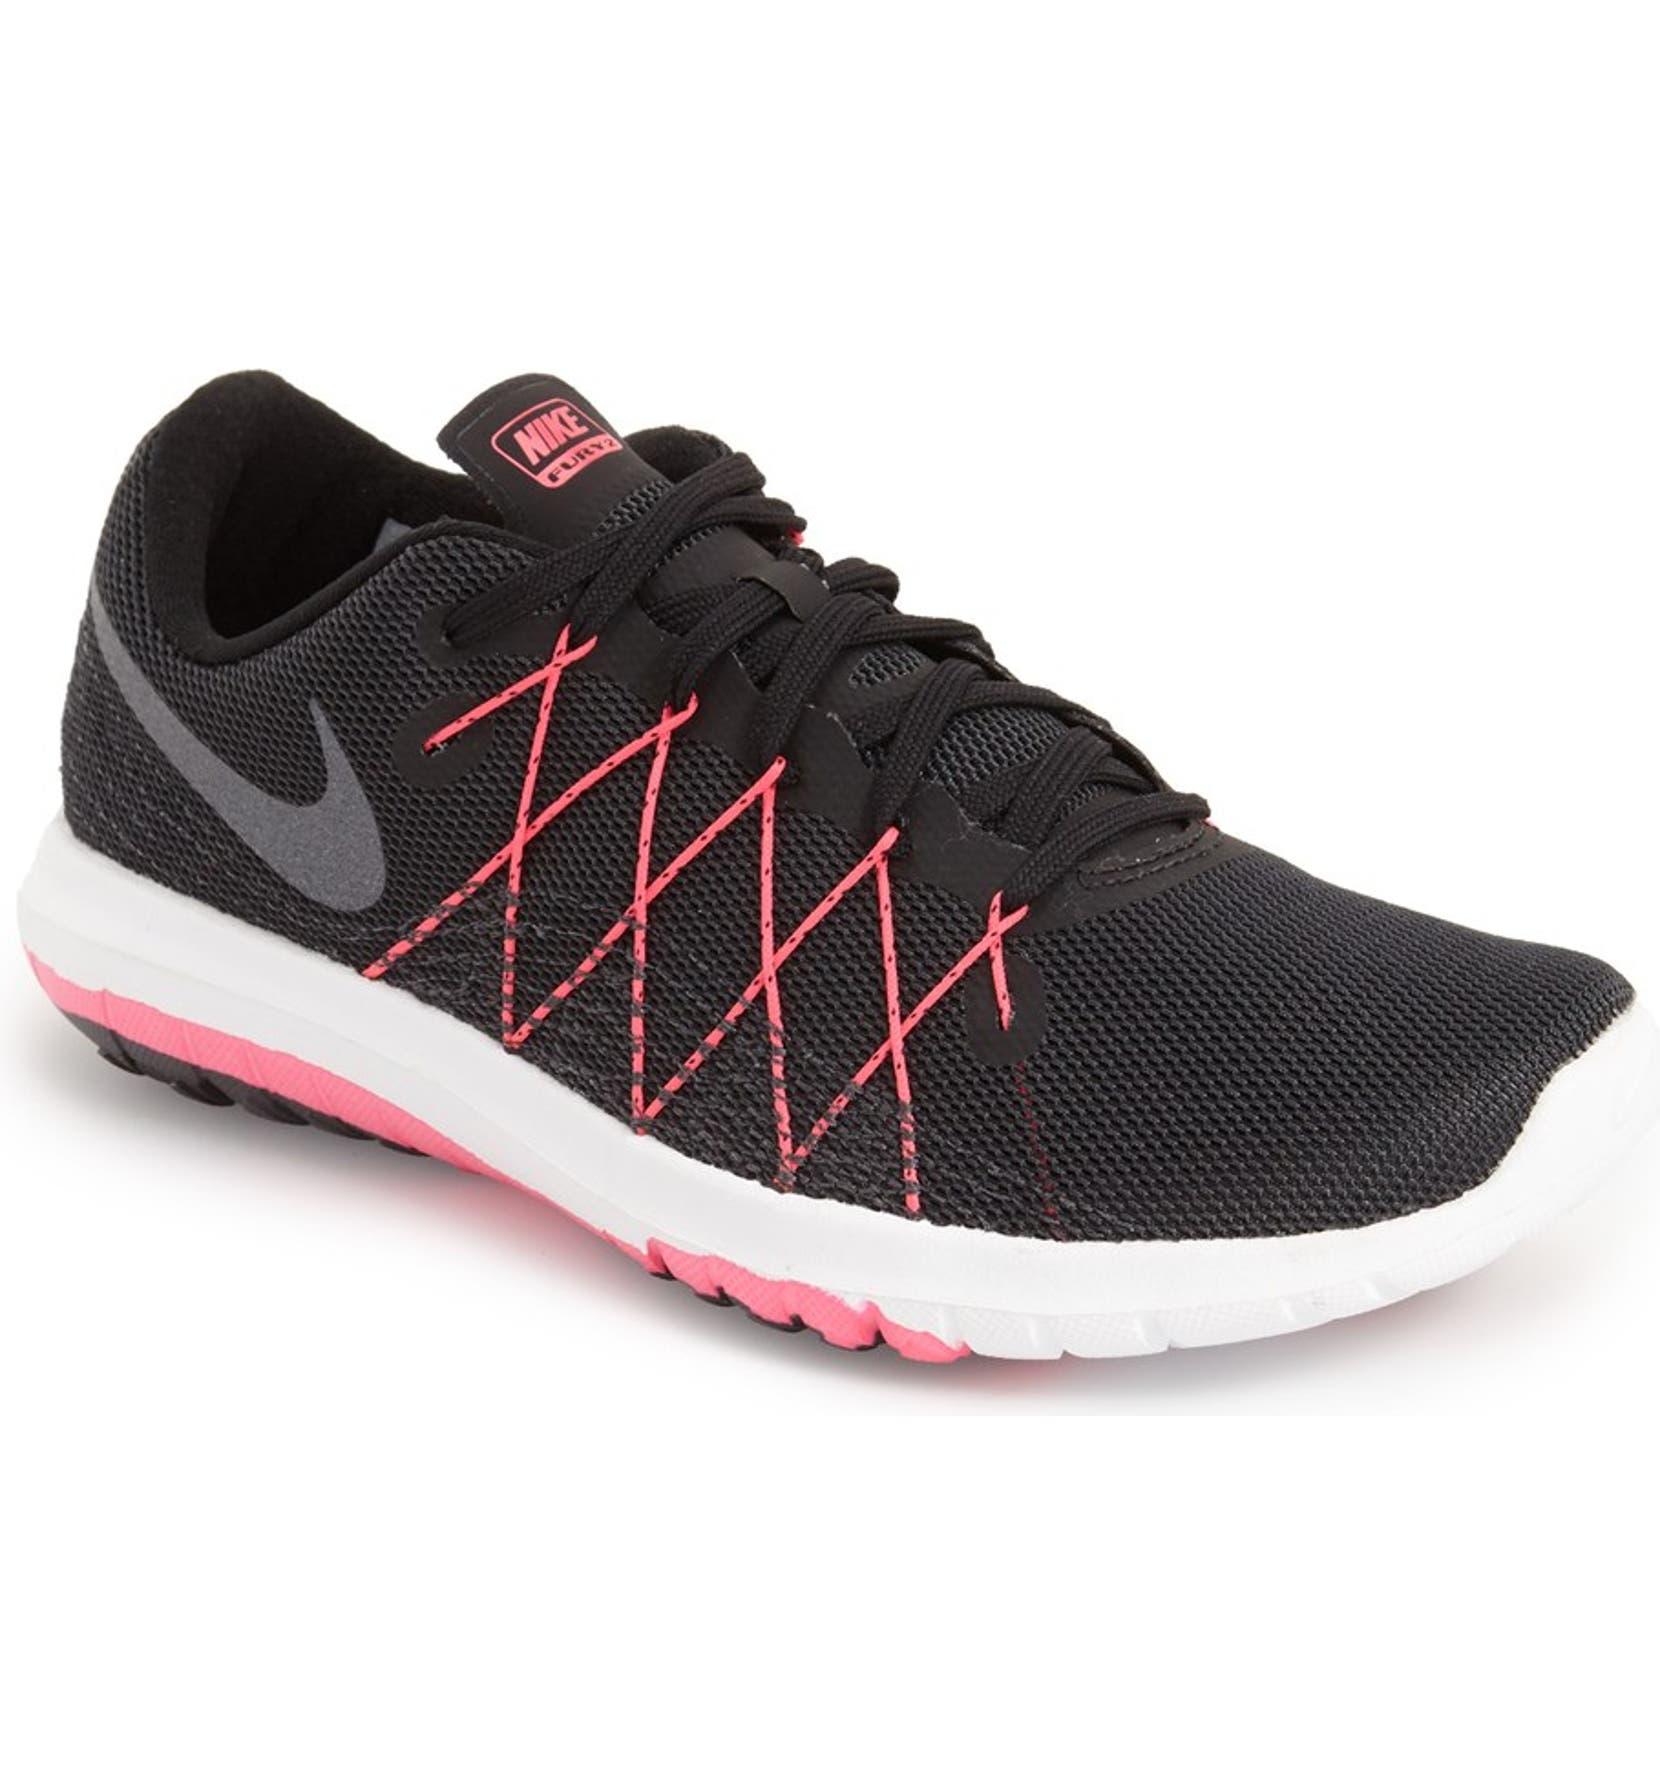 huge discount c5918 b6840 'Flex Fury 2' Running Shoe